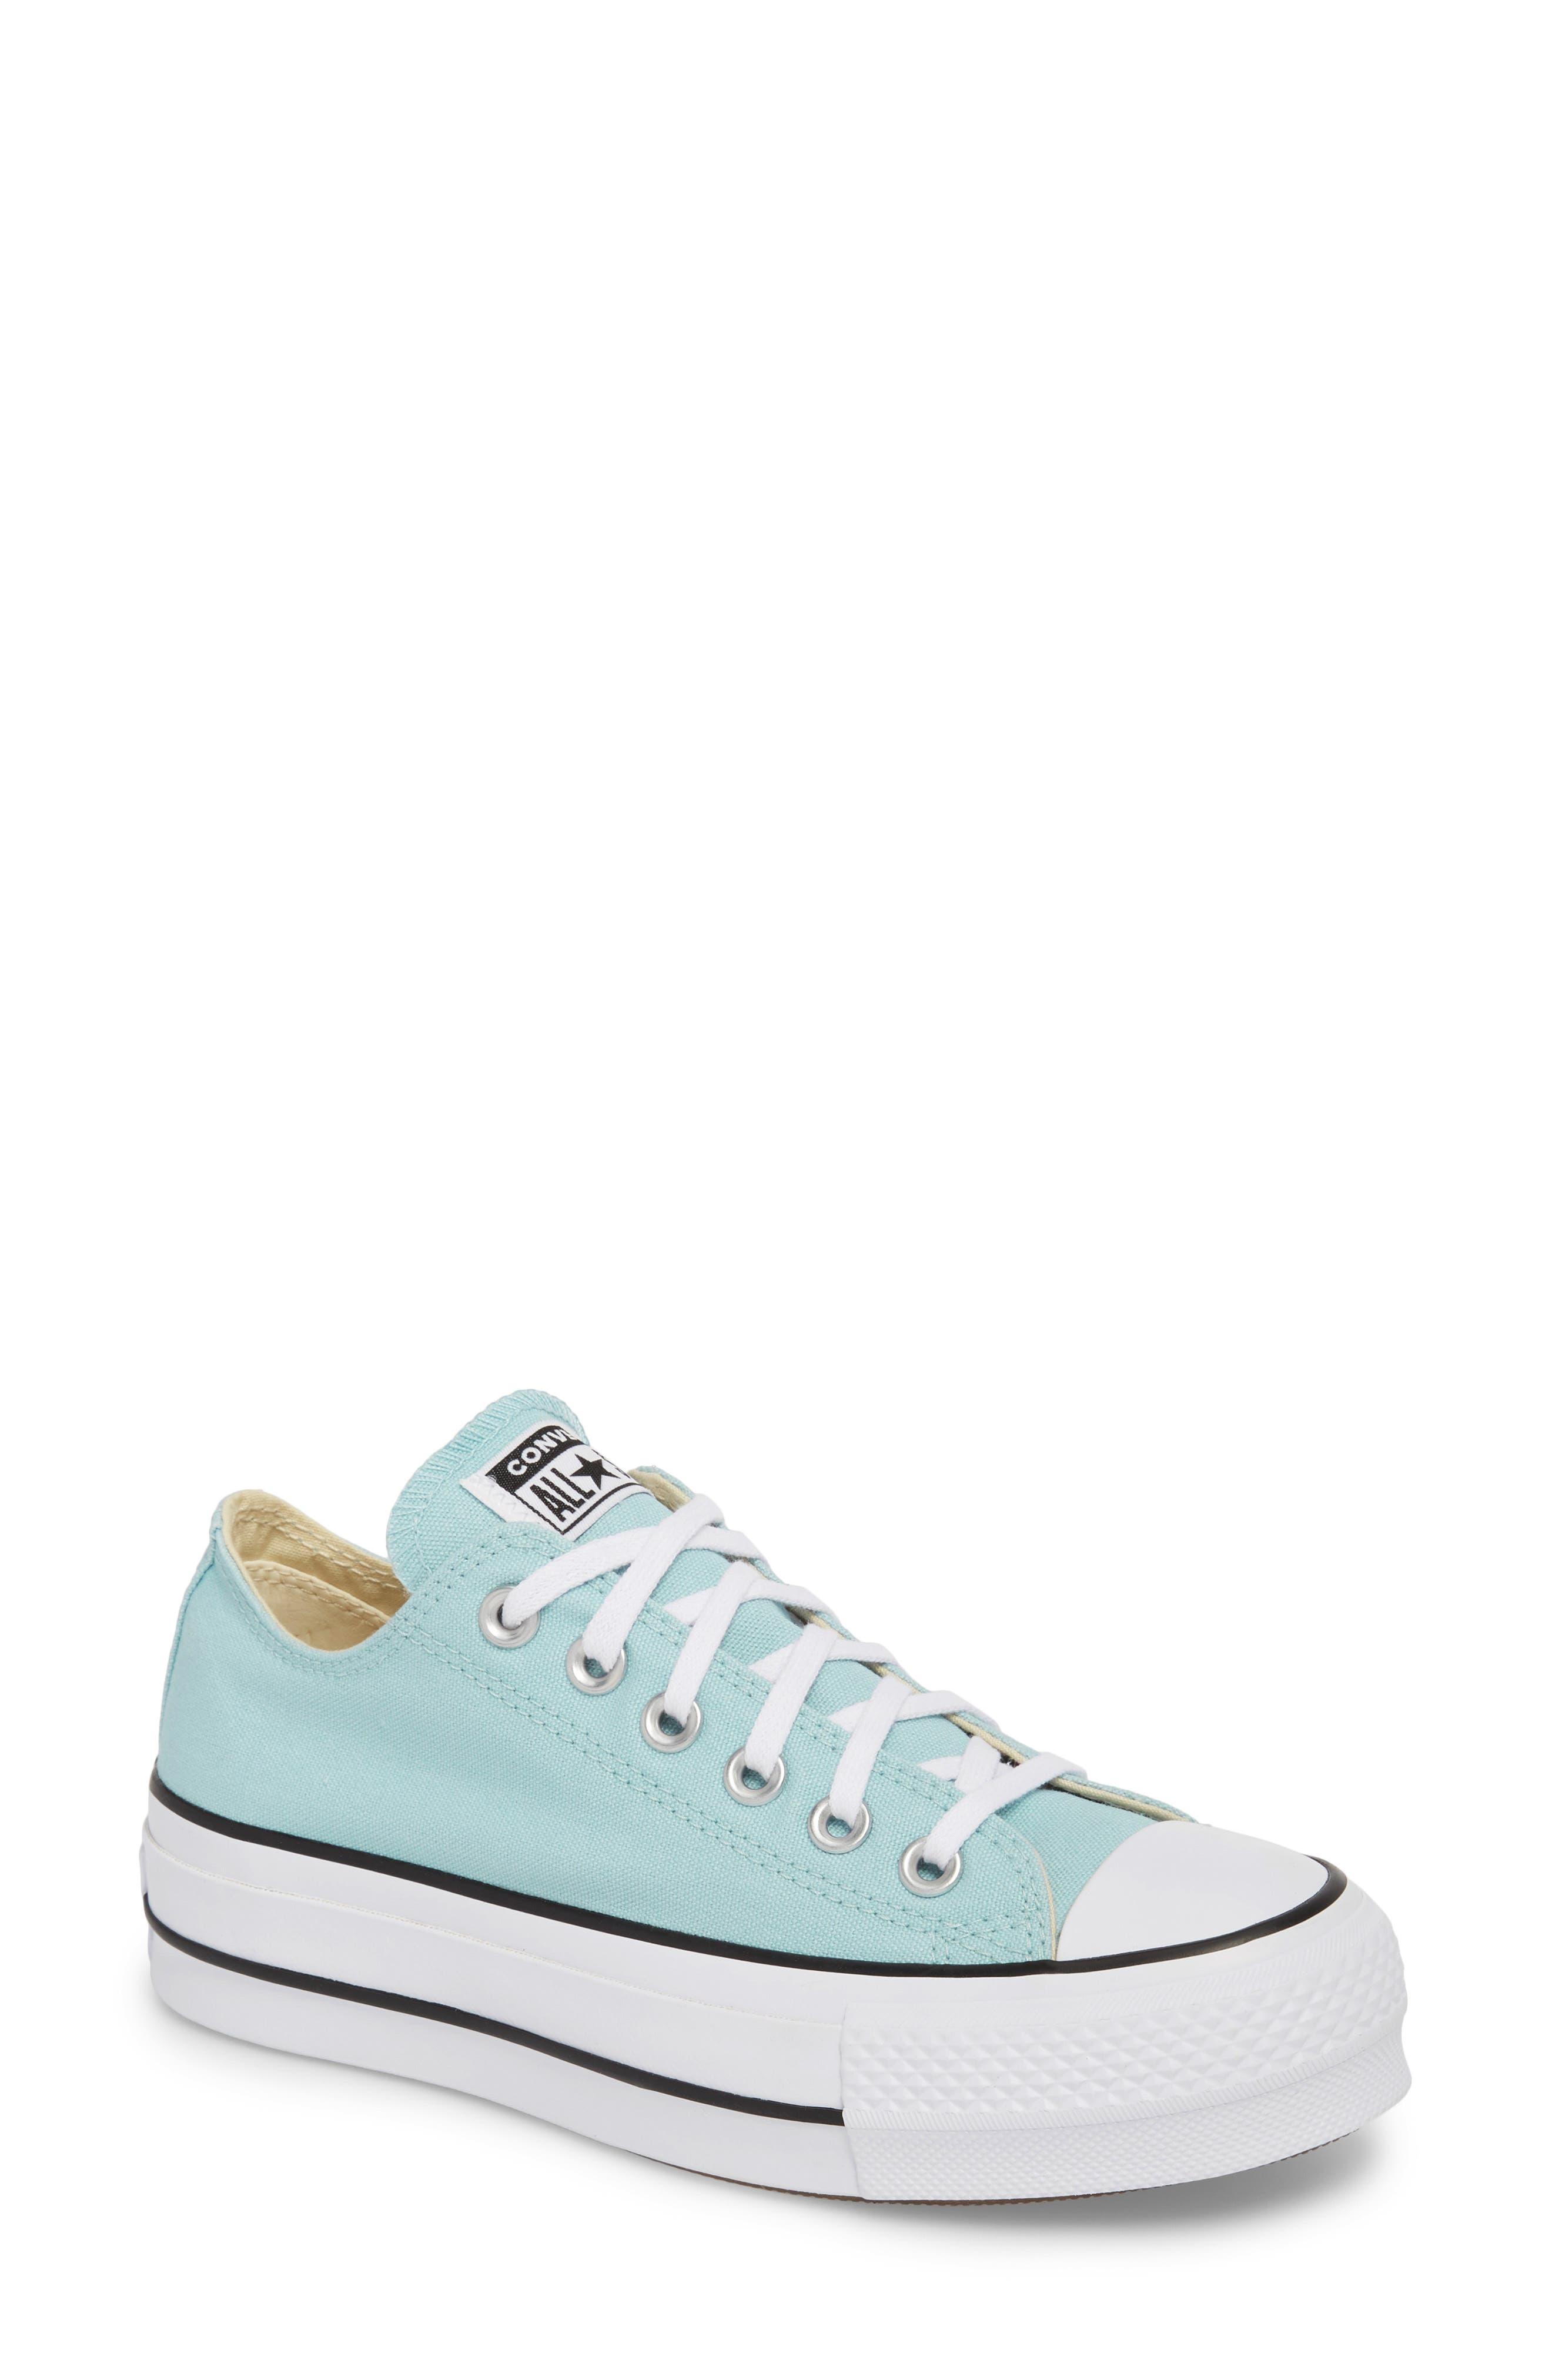 12ef340a254b Converse Chuck Taylor All Star Platform Sneaker In Ocean Bliss ...